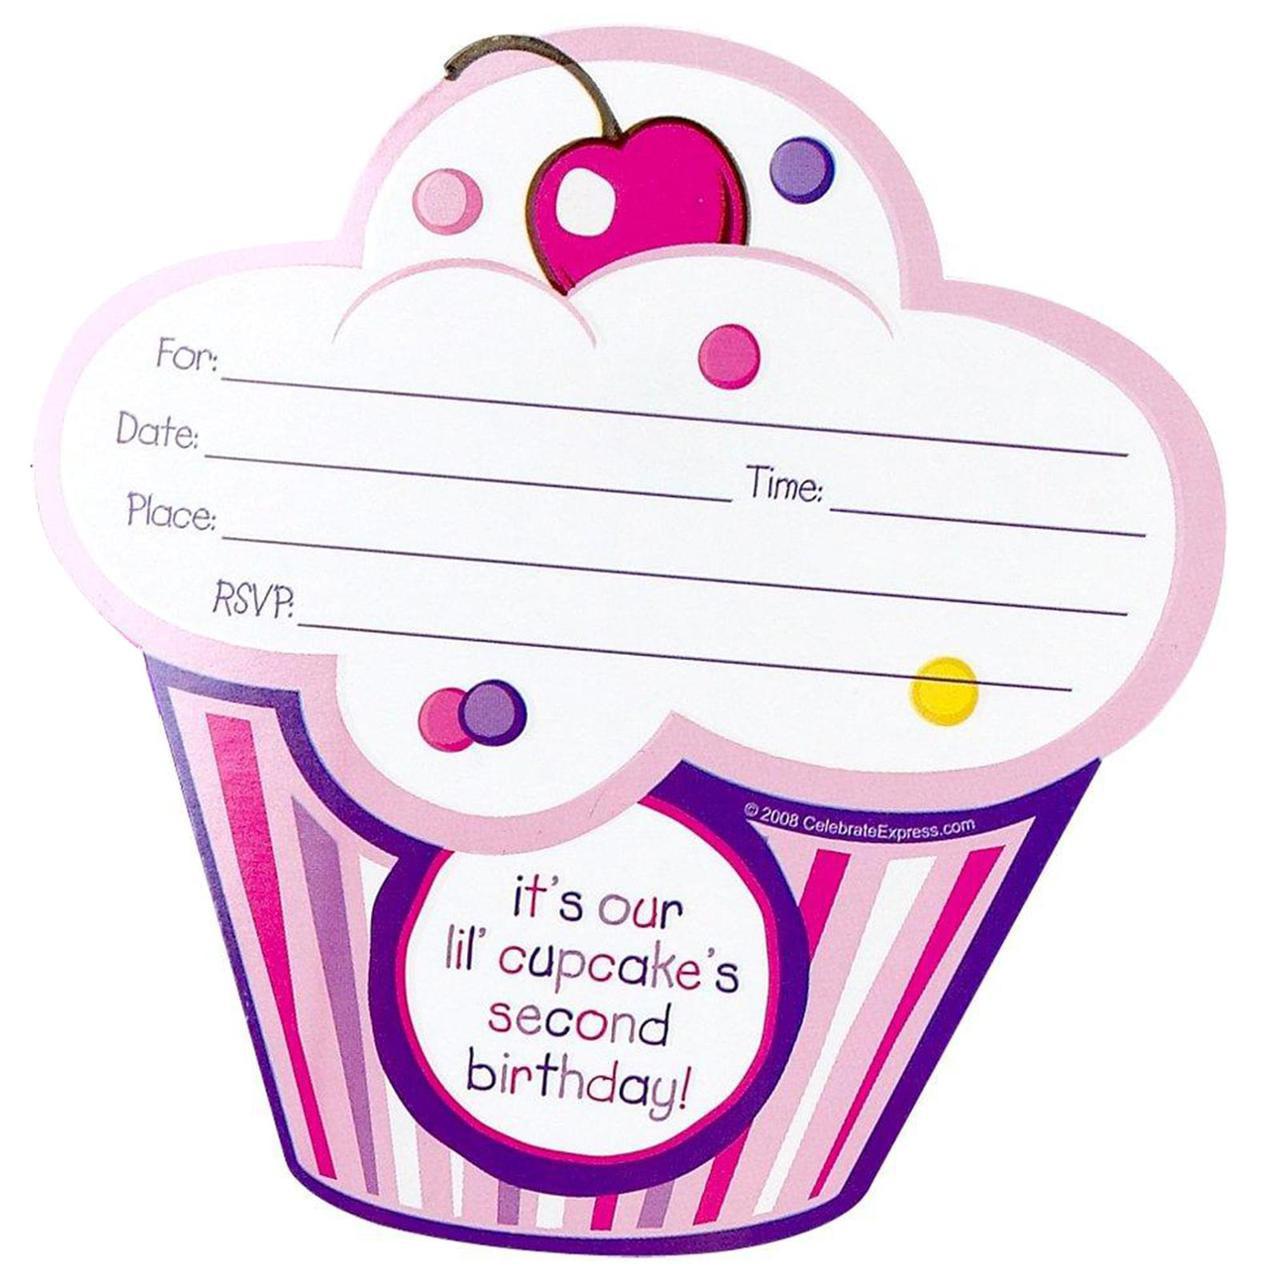 Girl's Lil' Cupcake 2nd Birthday Invitations